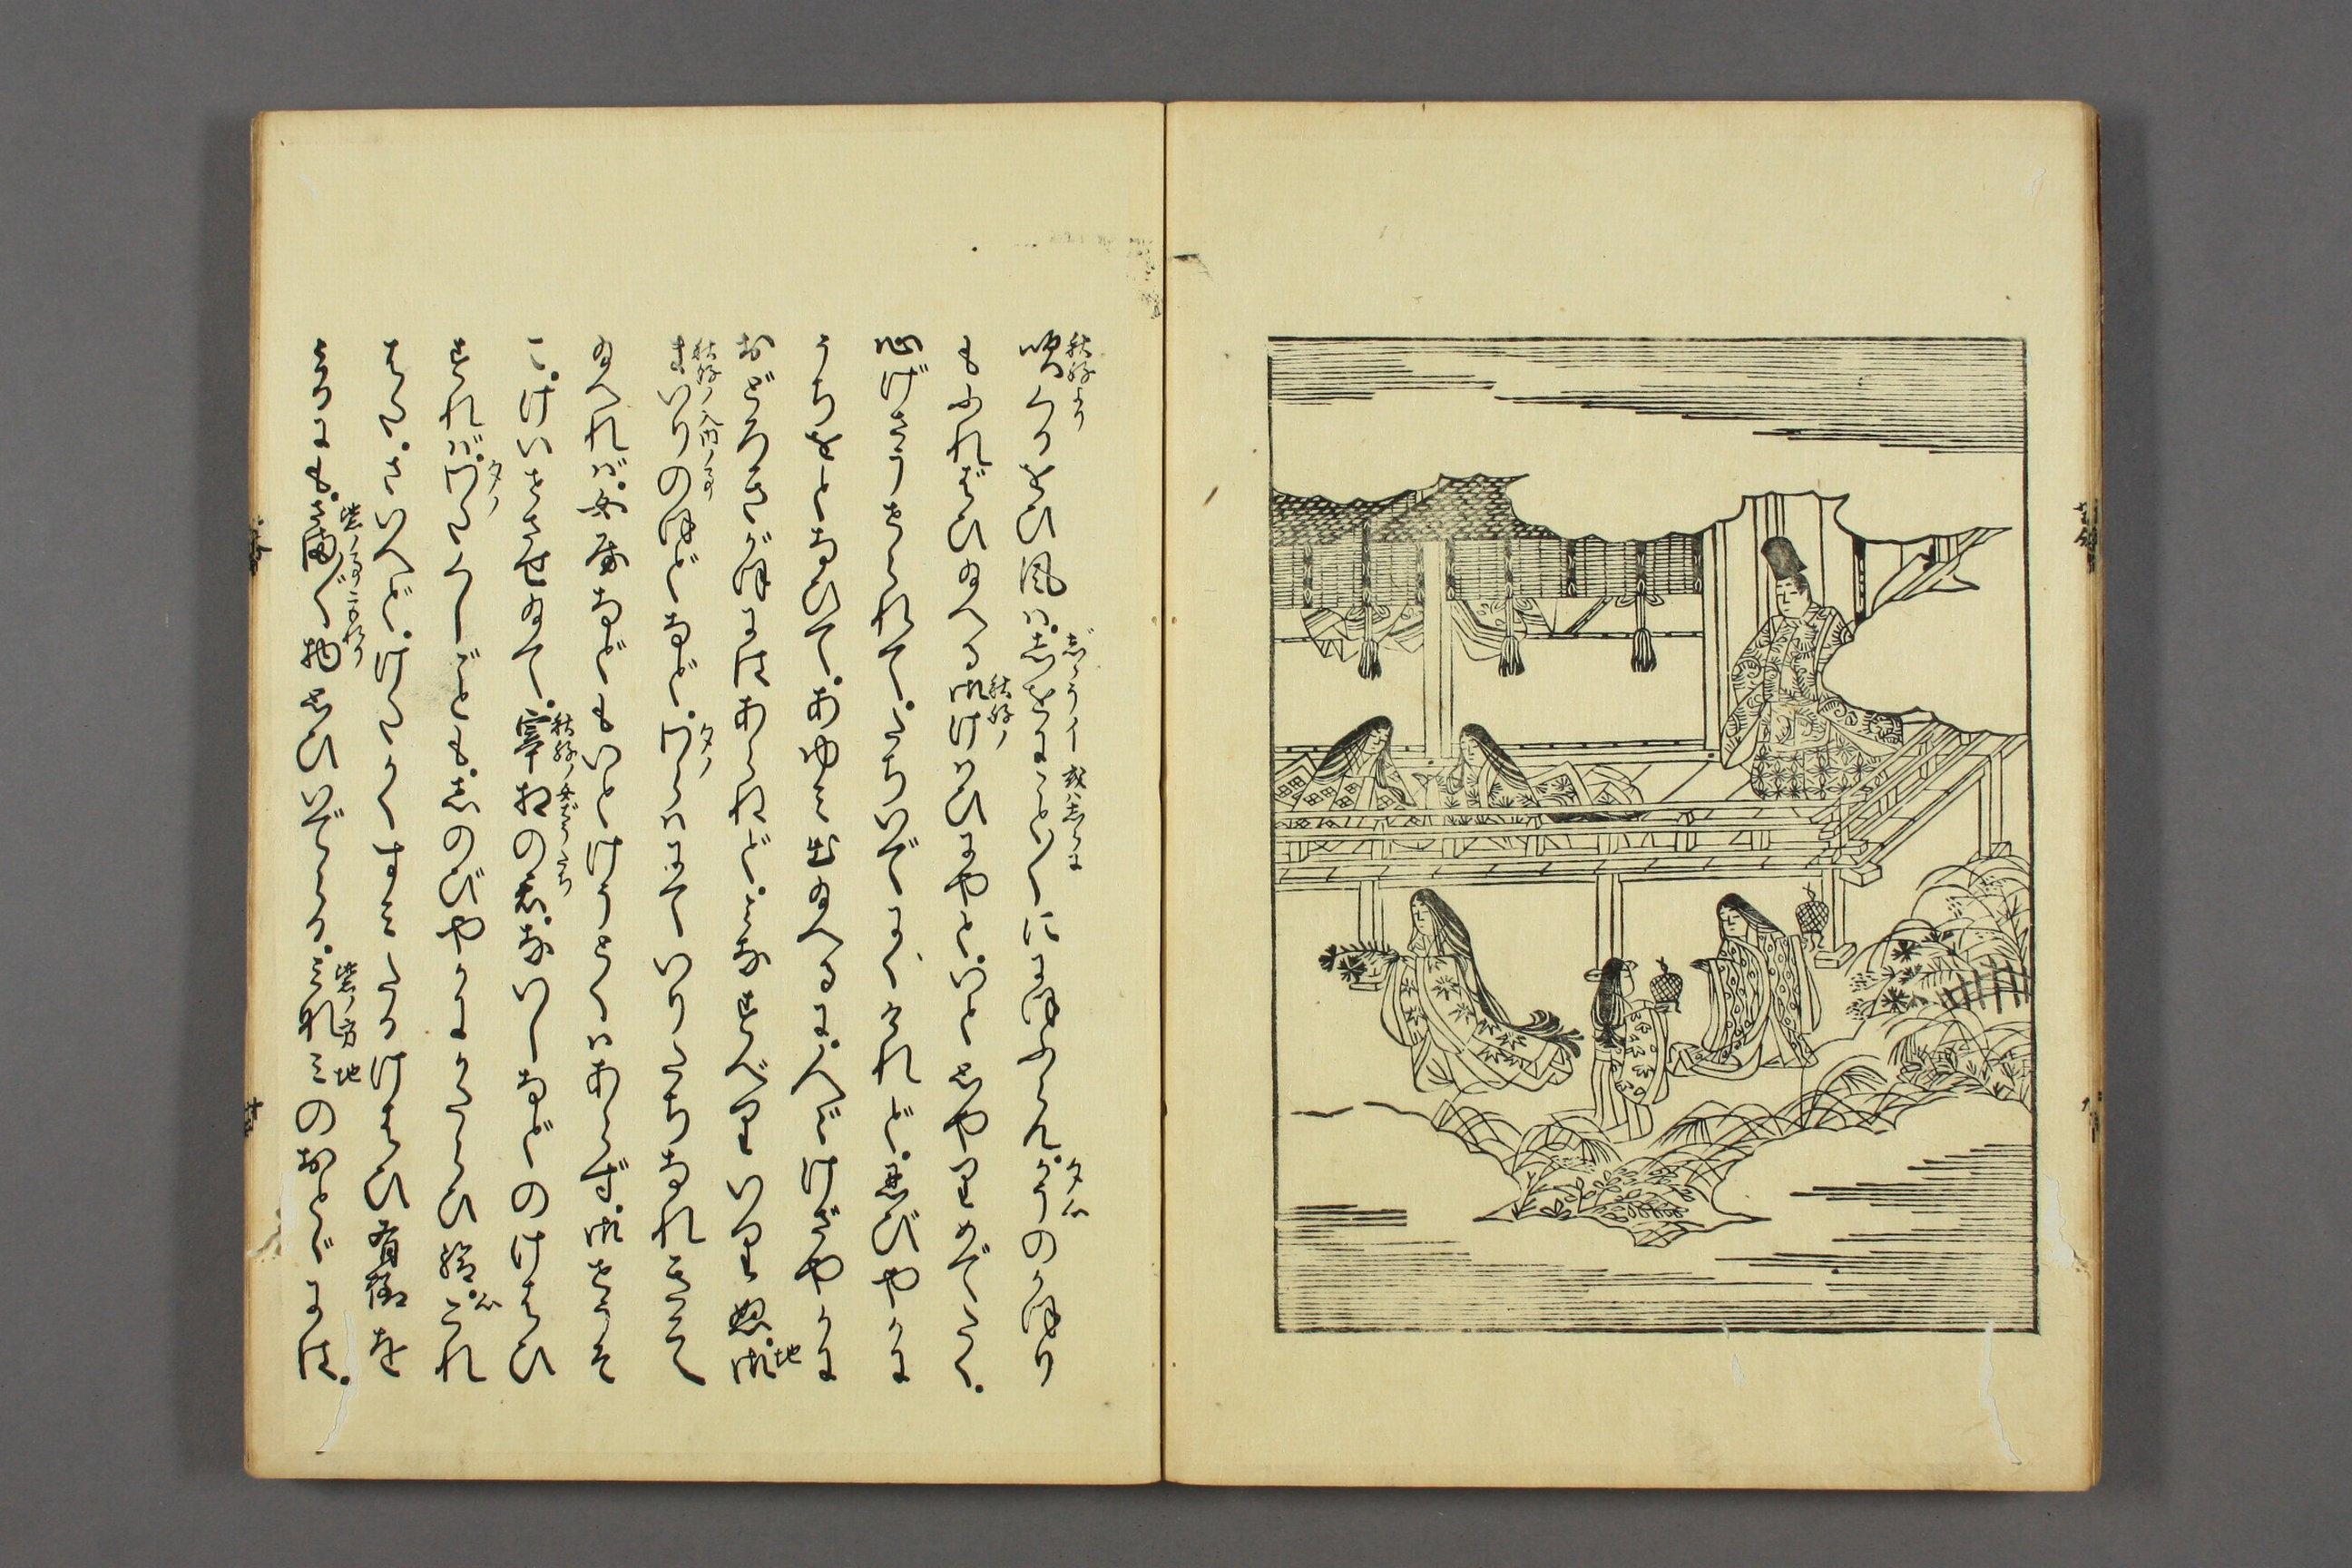 http://archive.wul.waseda.ac.jp/kosho/bunko30/bunko30_a0007/bunko30_a0007_0028/bunko30_a0007_0028_p0011.jpg